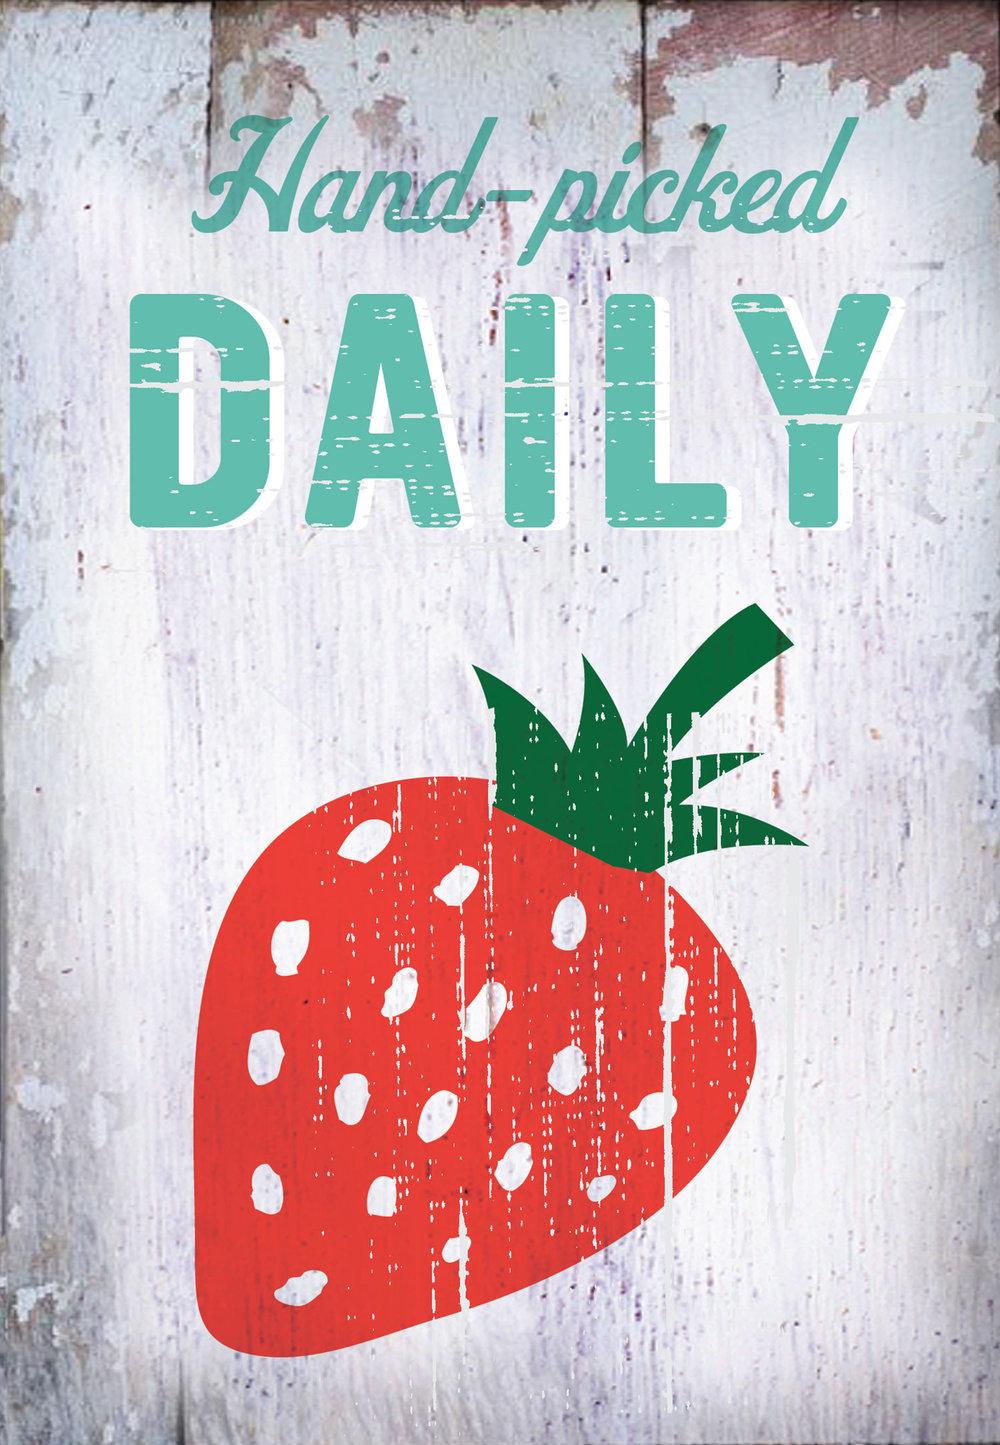 Met-Market-Branding-Strawberries-Poster-Yuri-Shvets-06.jpg